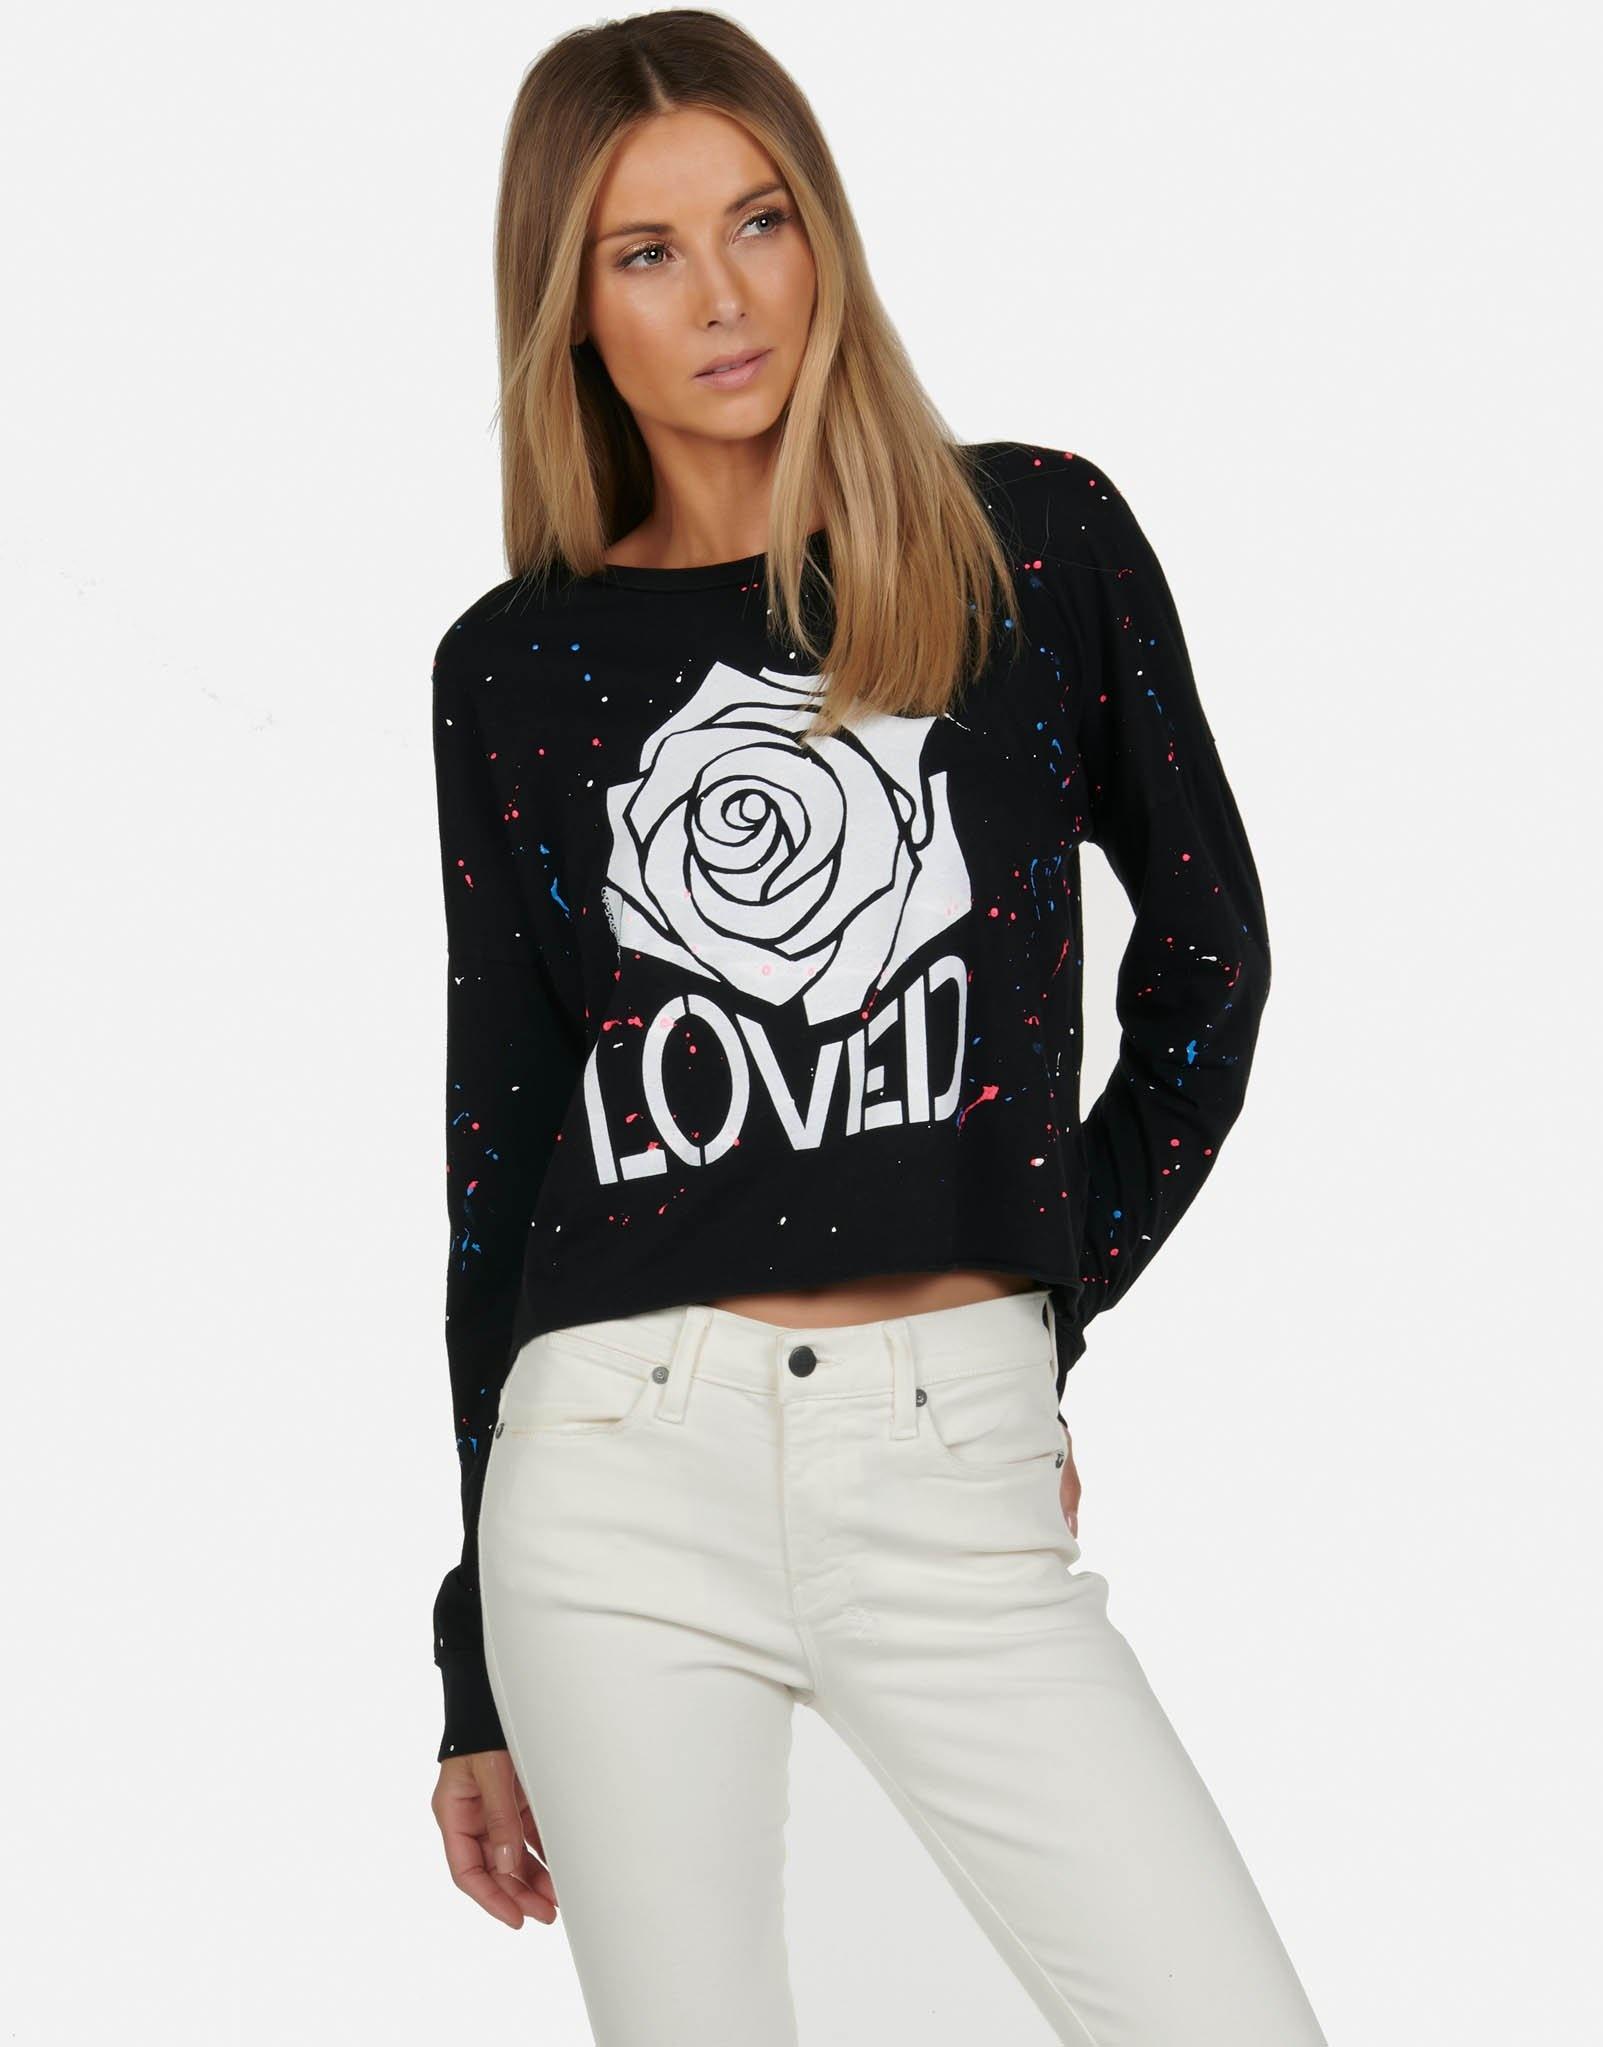 Lauren Moshi Black Lori L/S Crop Tee - Loved Rose